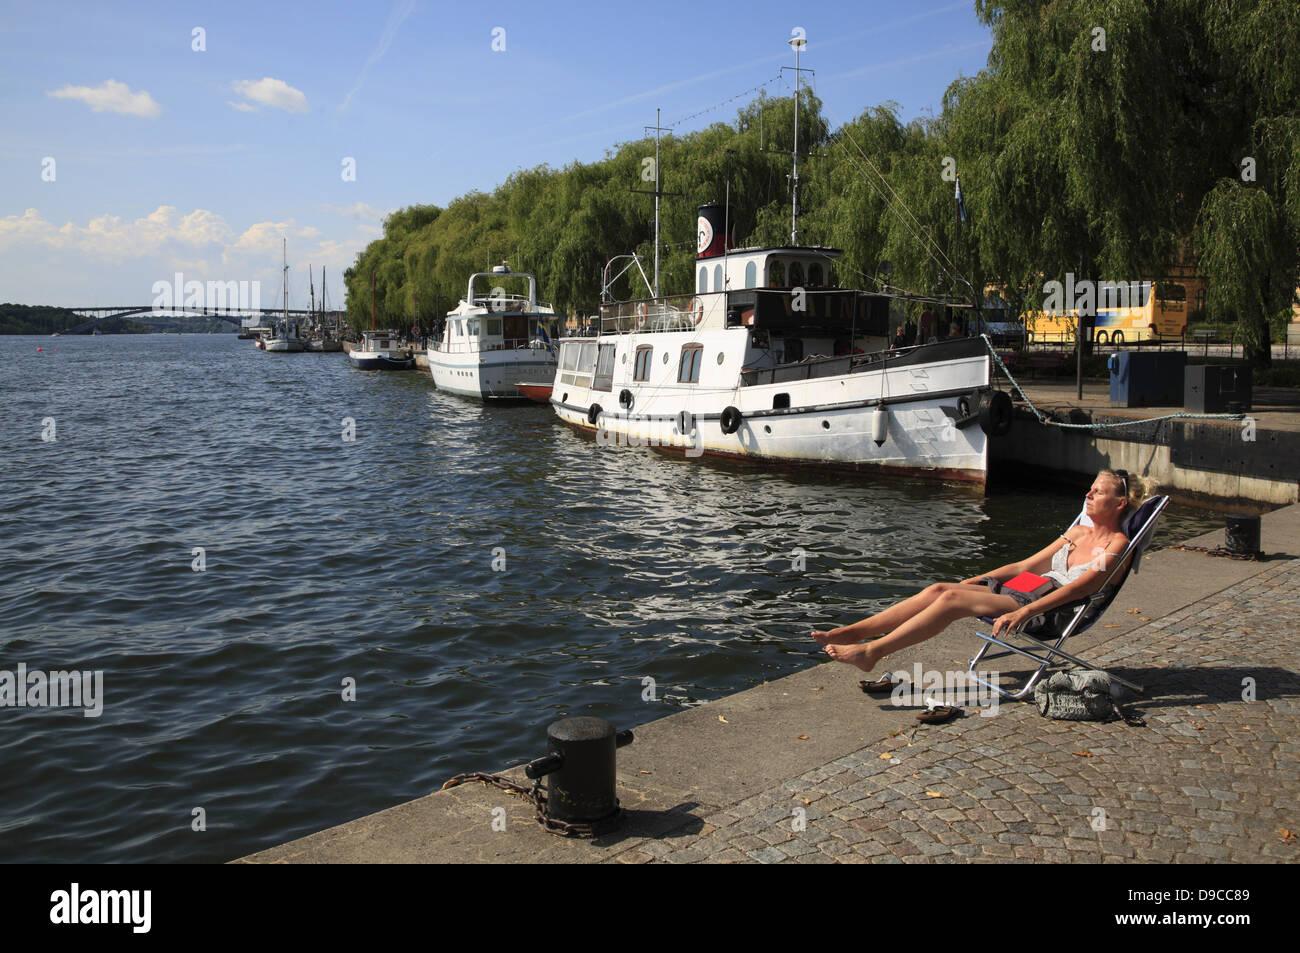 Sunbath at am Riddarfjaerden, Stockholm, Sweden, Scandinavia - Stock Image